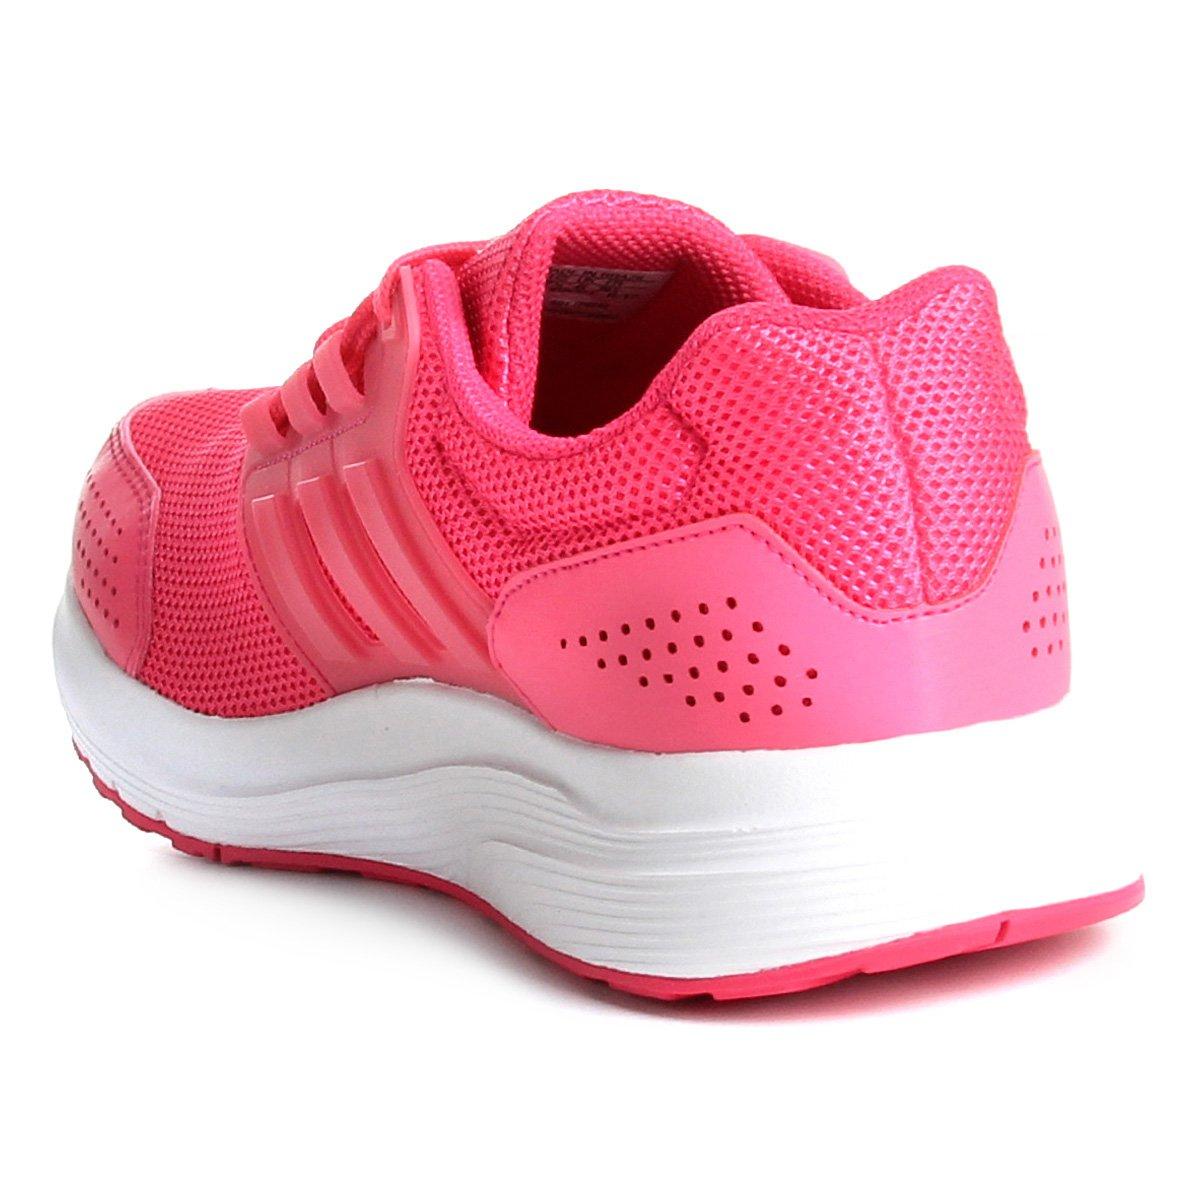 Rosa 4 Adidas Tênis Adidas Tênis Galaxy 4 Feminino Galaxy xWTT8wHZfn